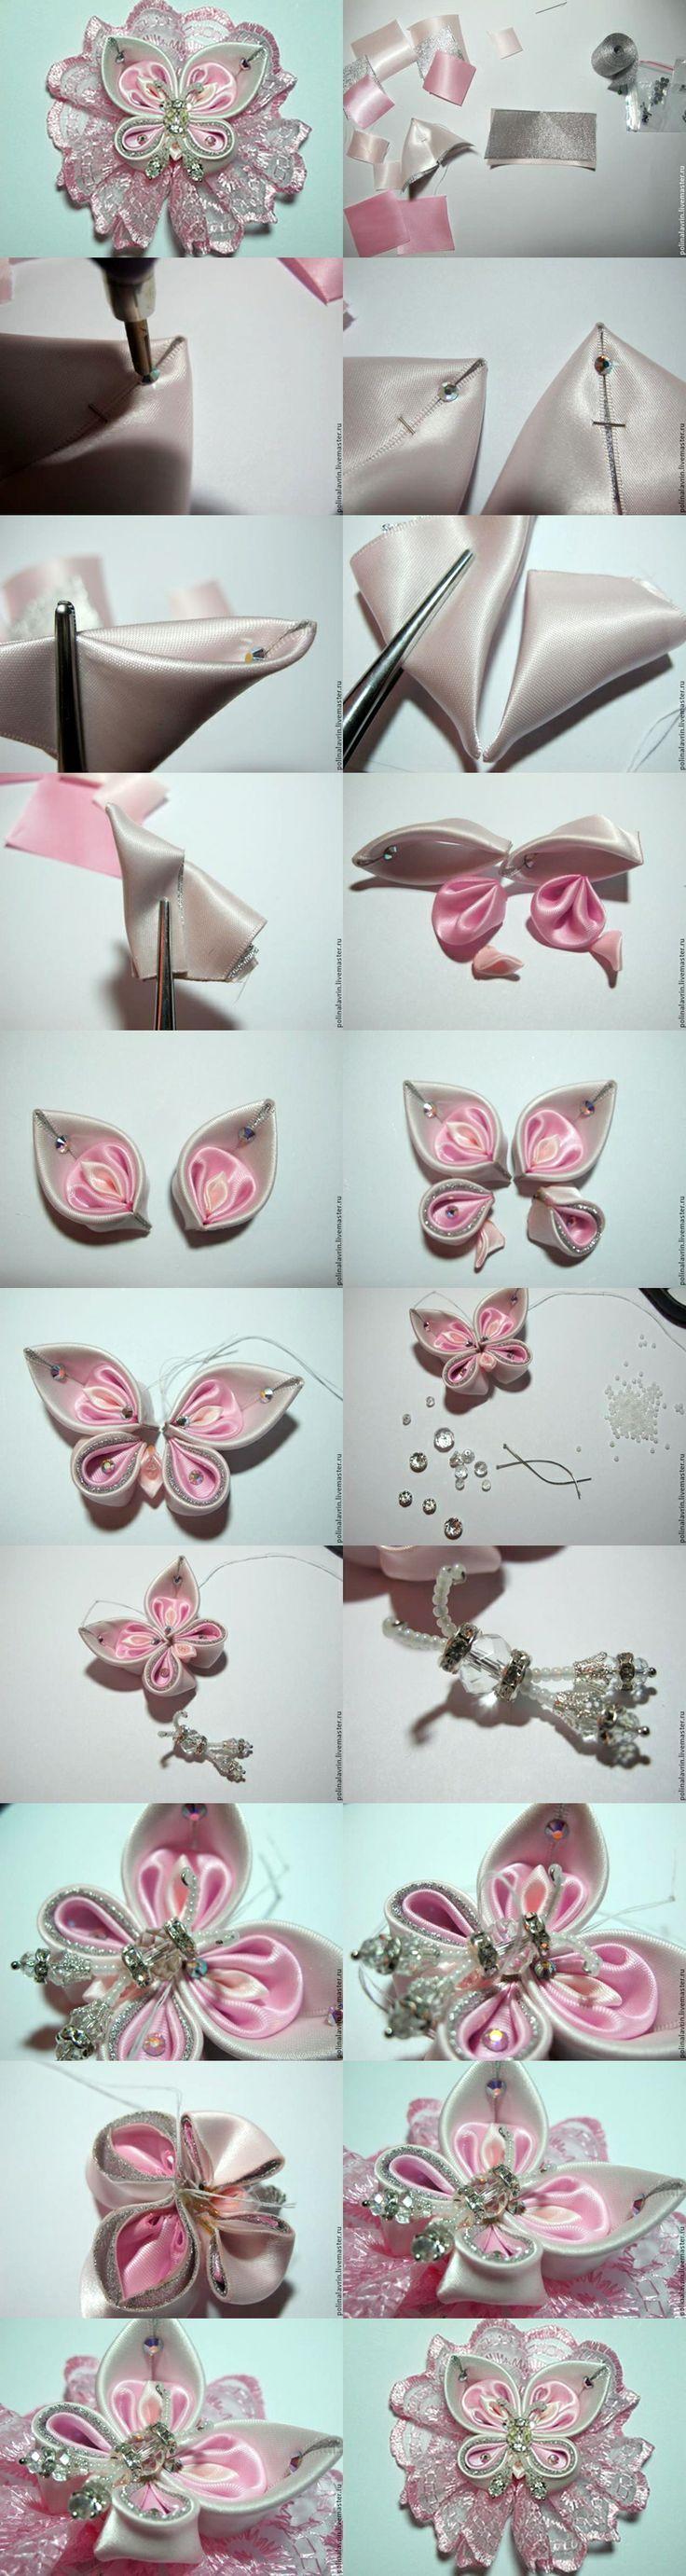 d1c0c84e7cb6c37559b4daed6faed70d.jpg (736×2762) Pita kupu-kupu cantik!